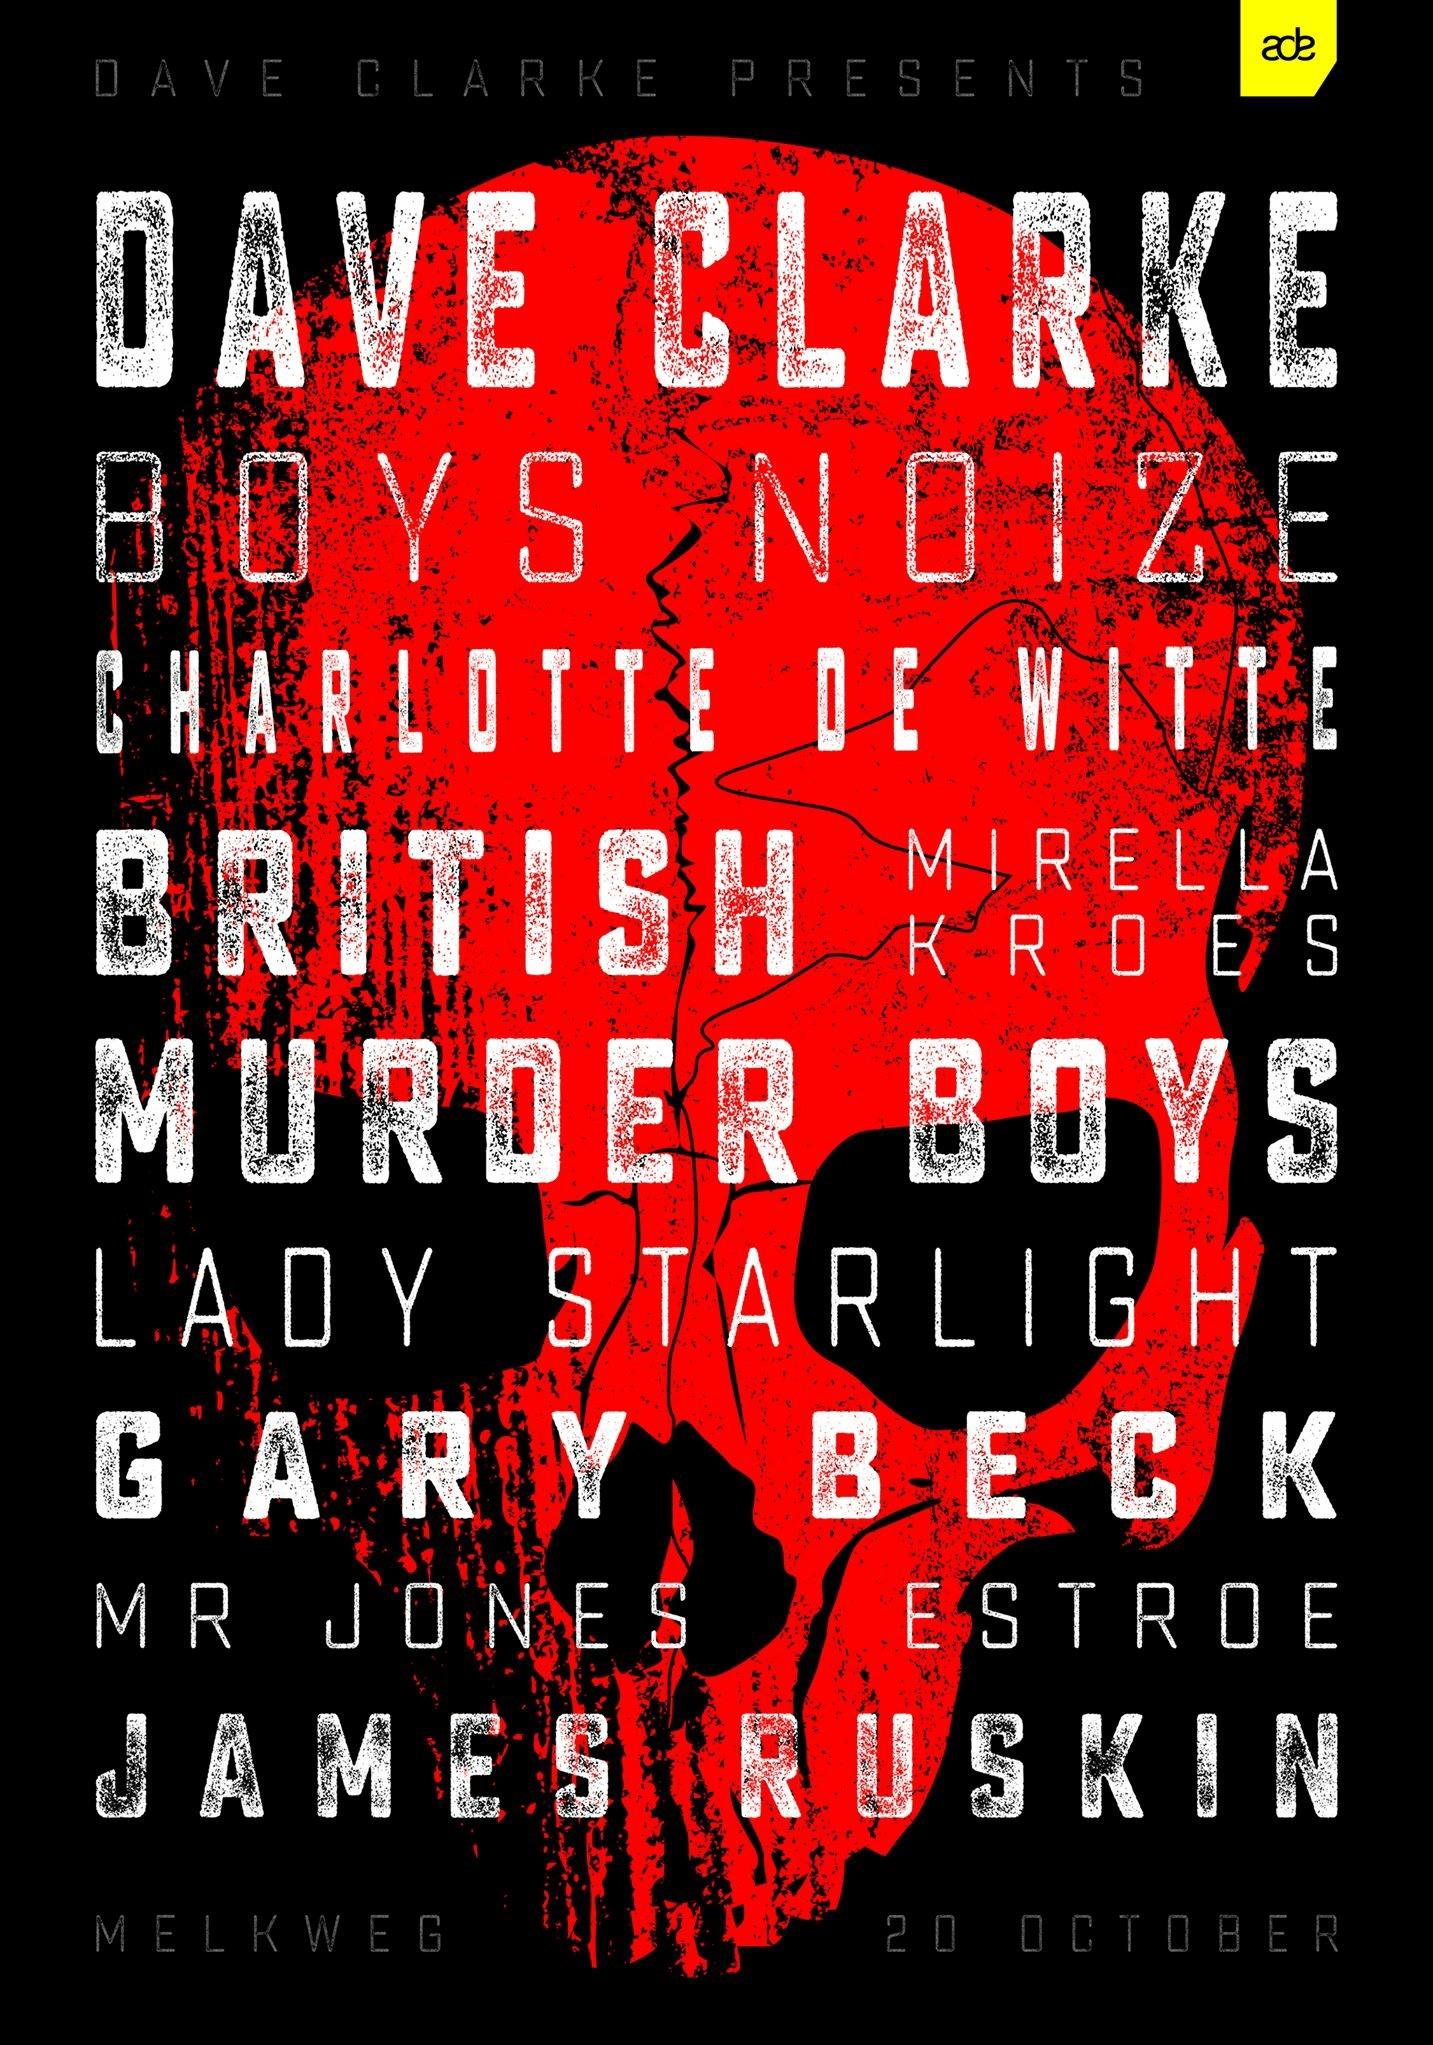 Dave Clarke Presents